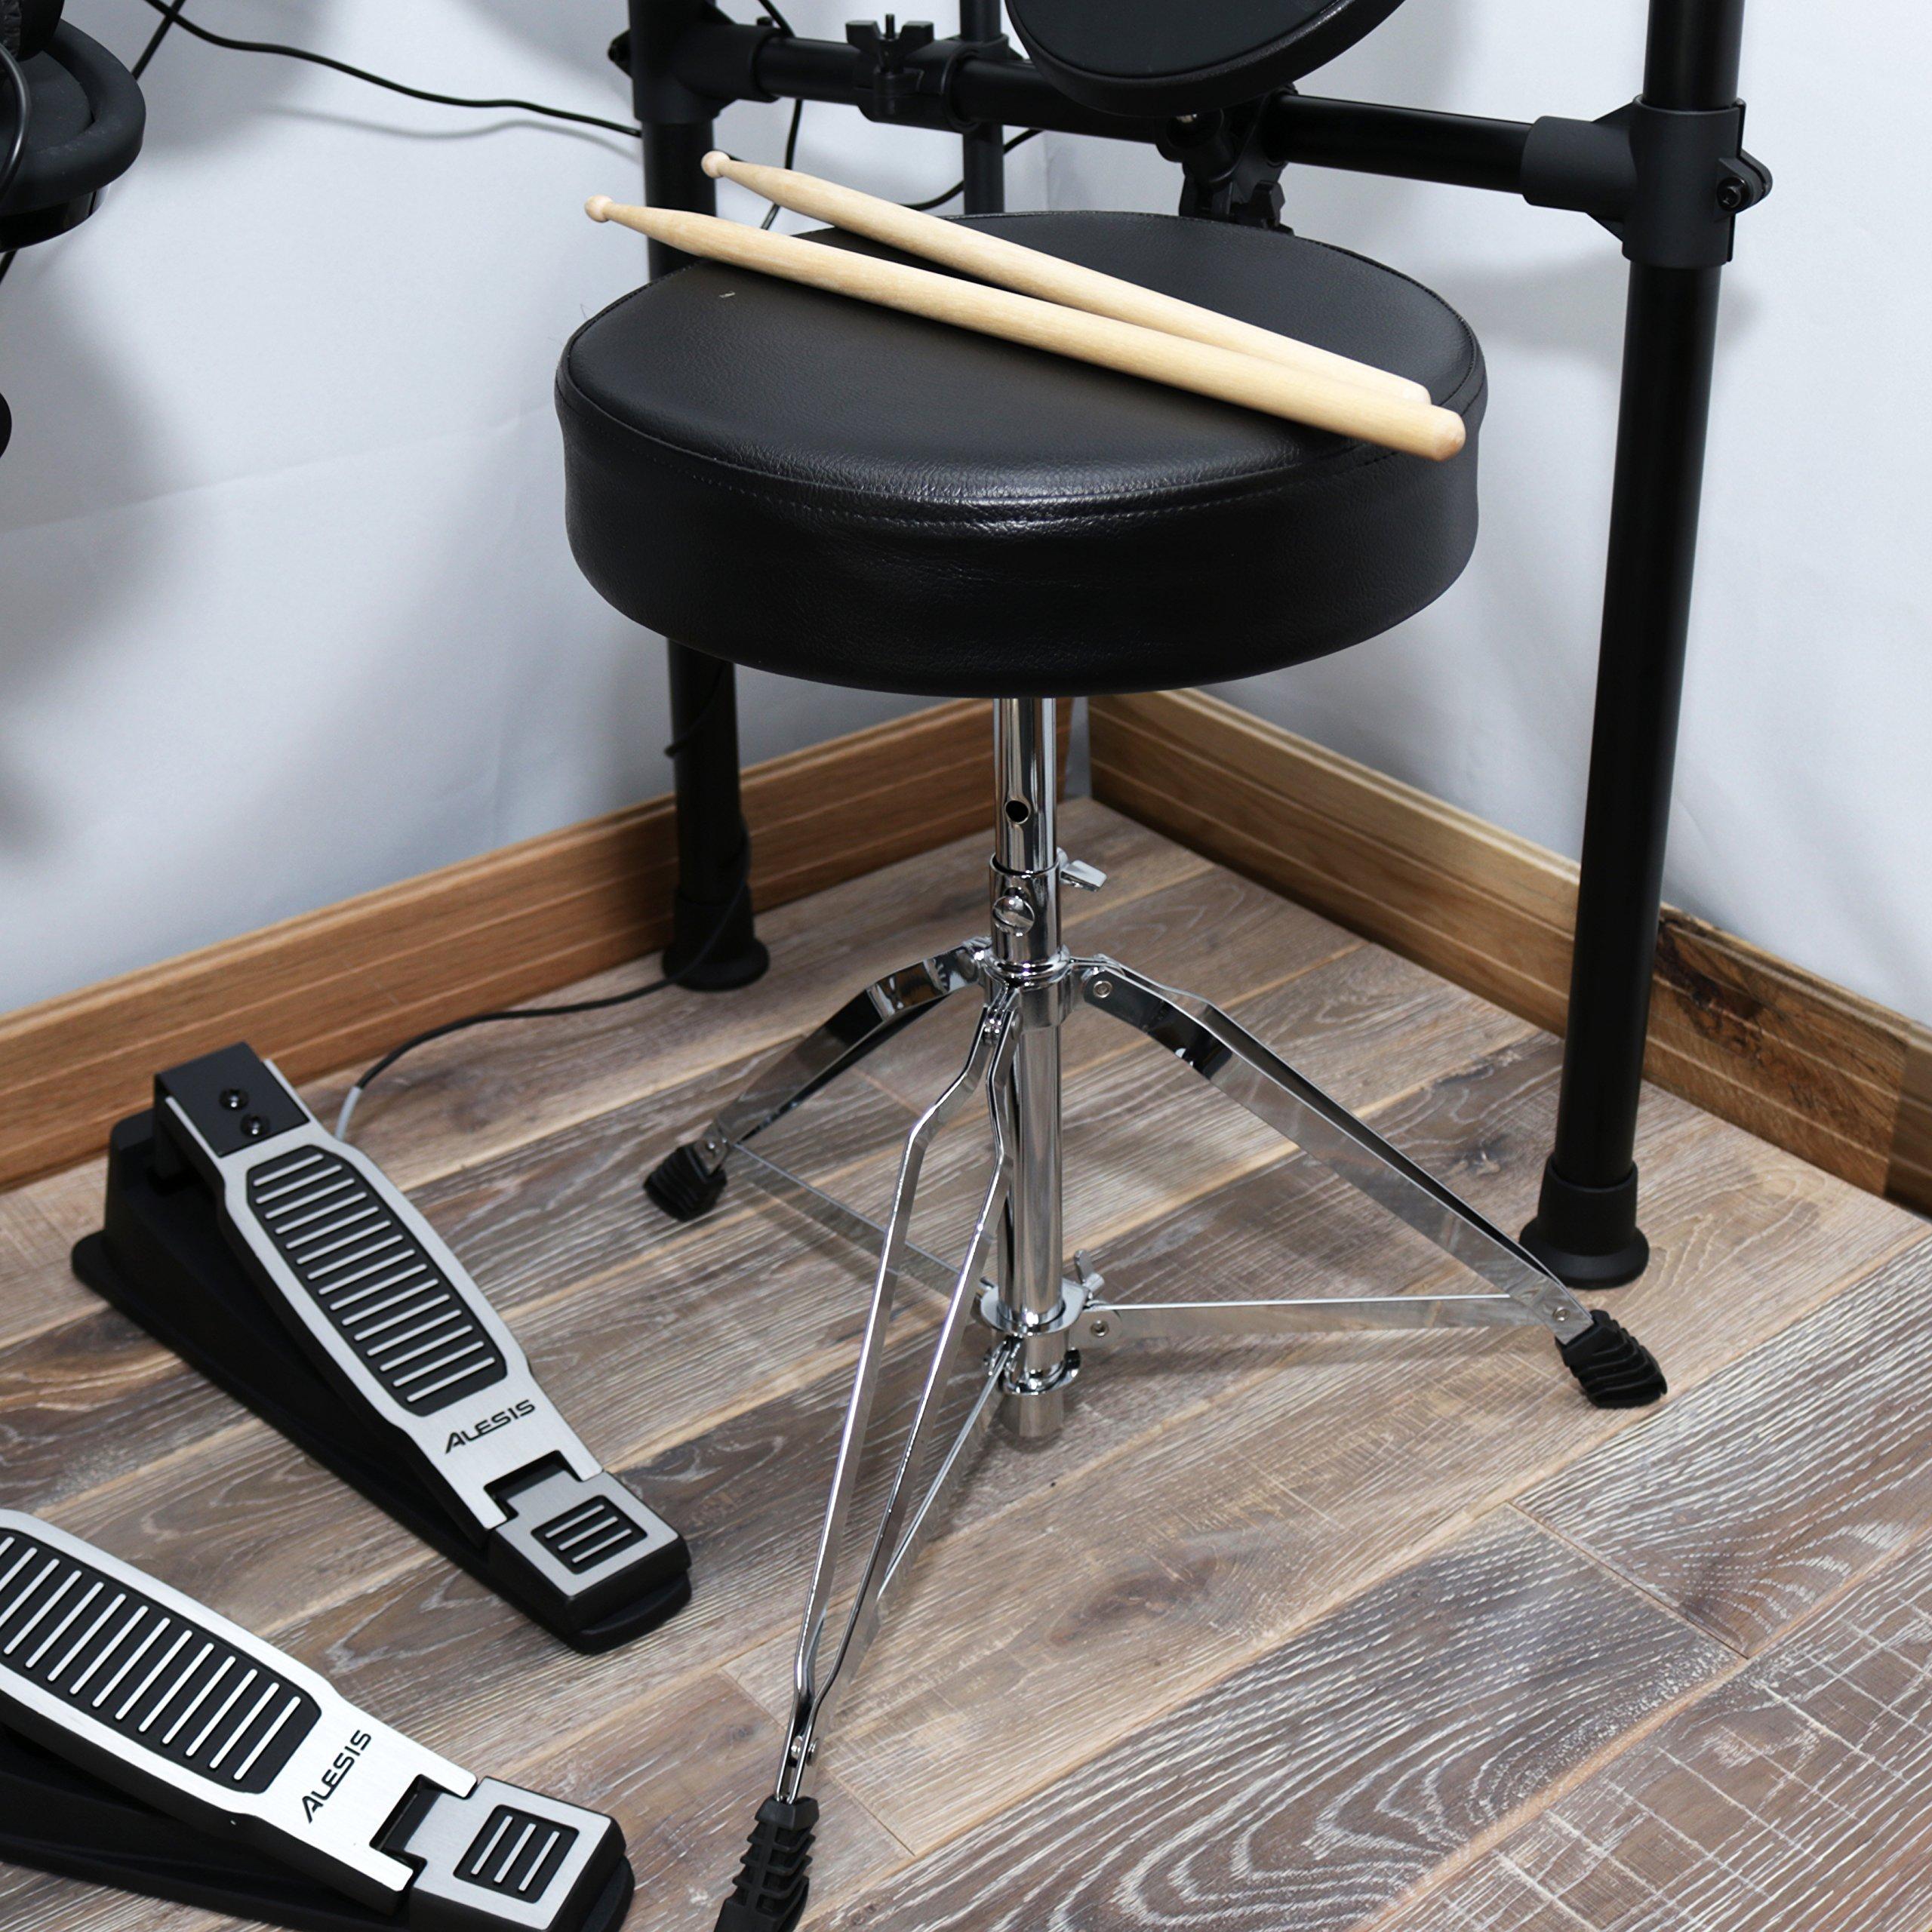 Alesis Seven-Piece Electronic Drum Burst Kit with DM6 Drum Module Includes Drum Throne, Drum Sticks, and FREE Headphones